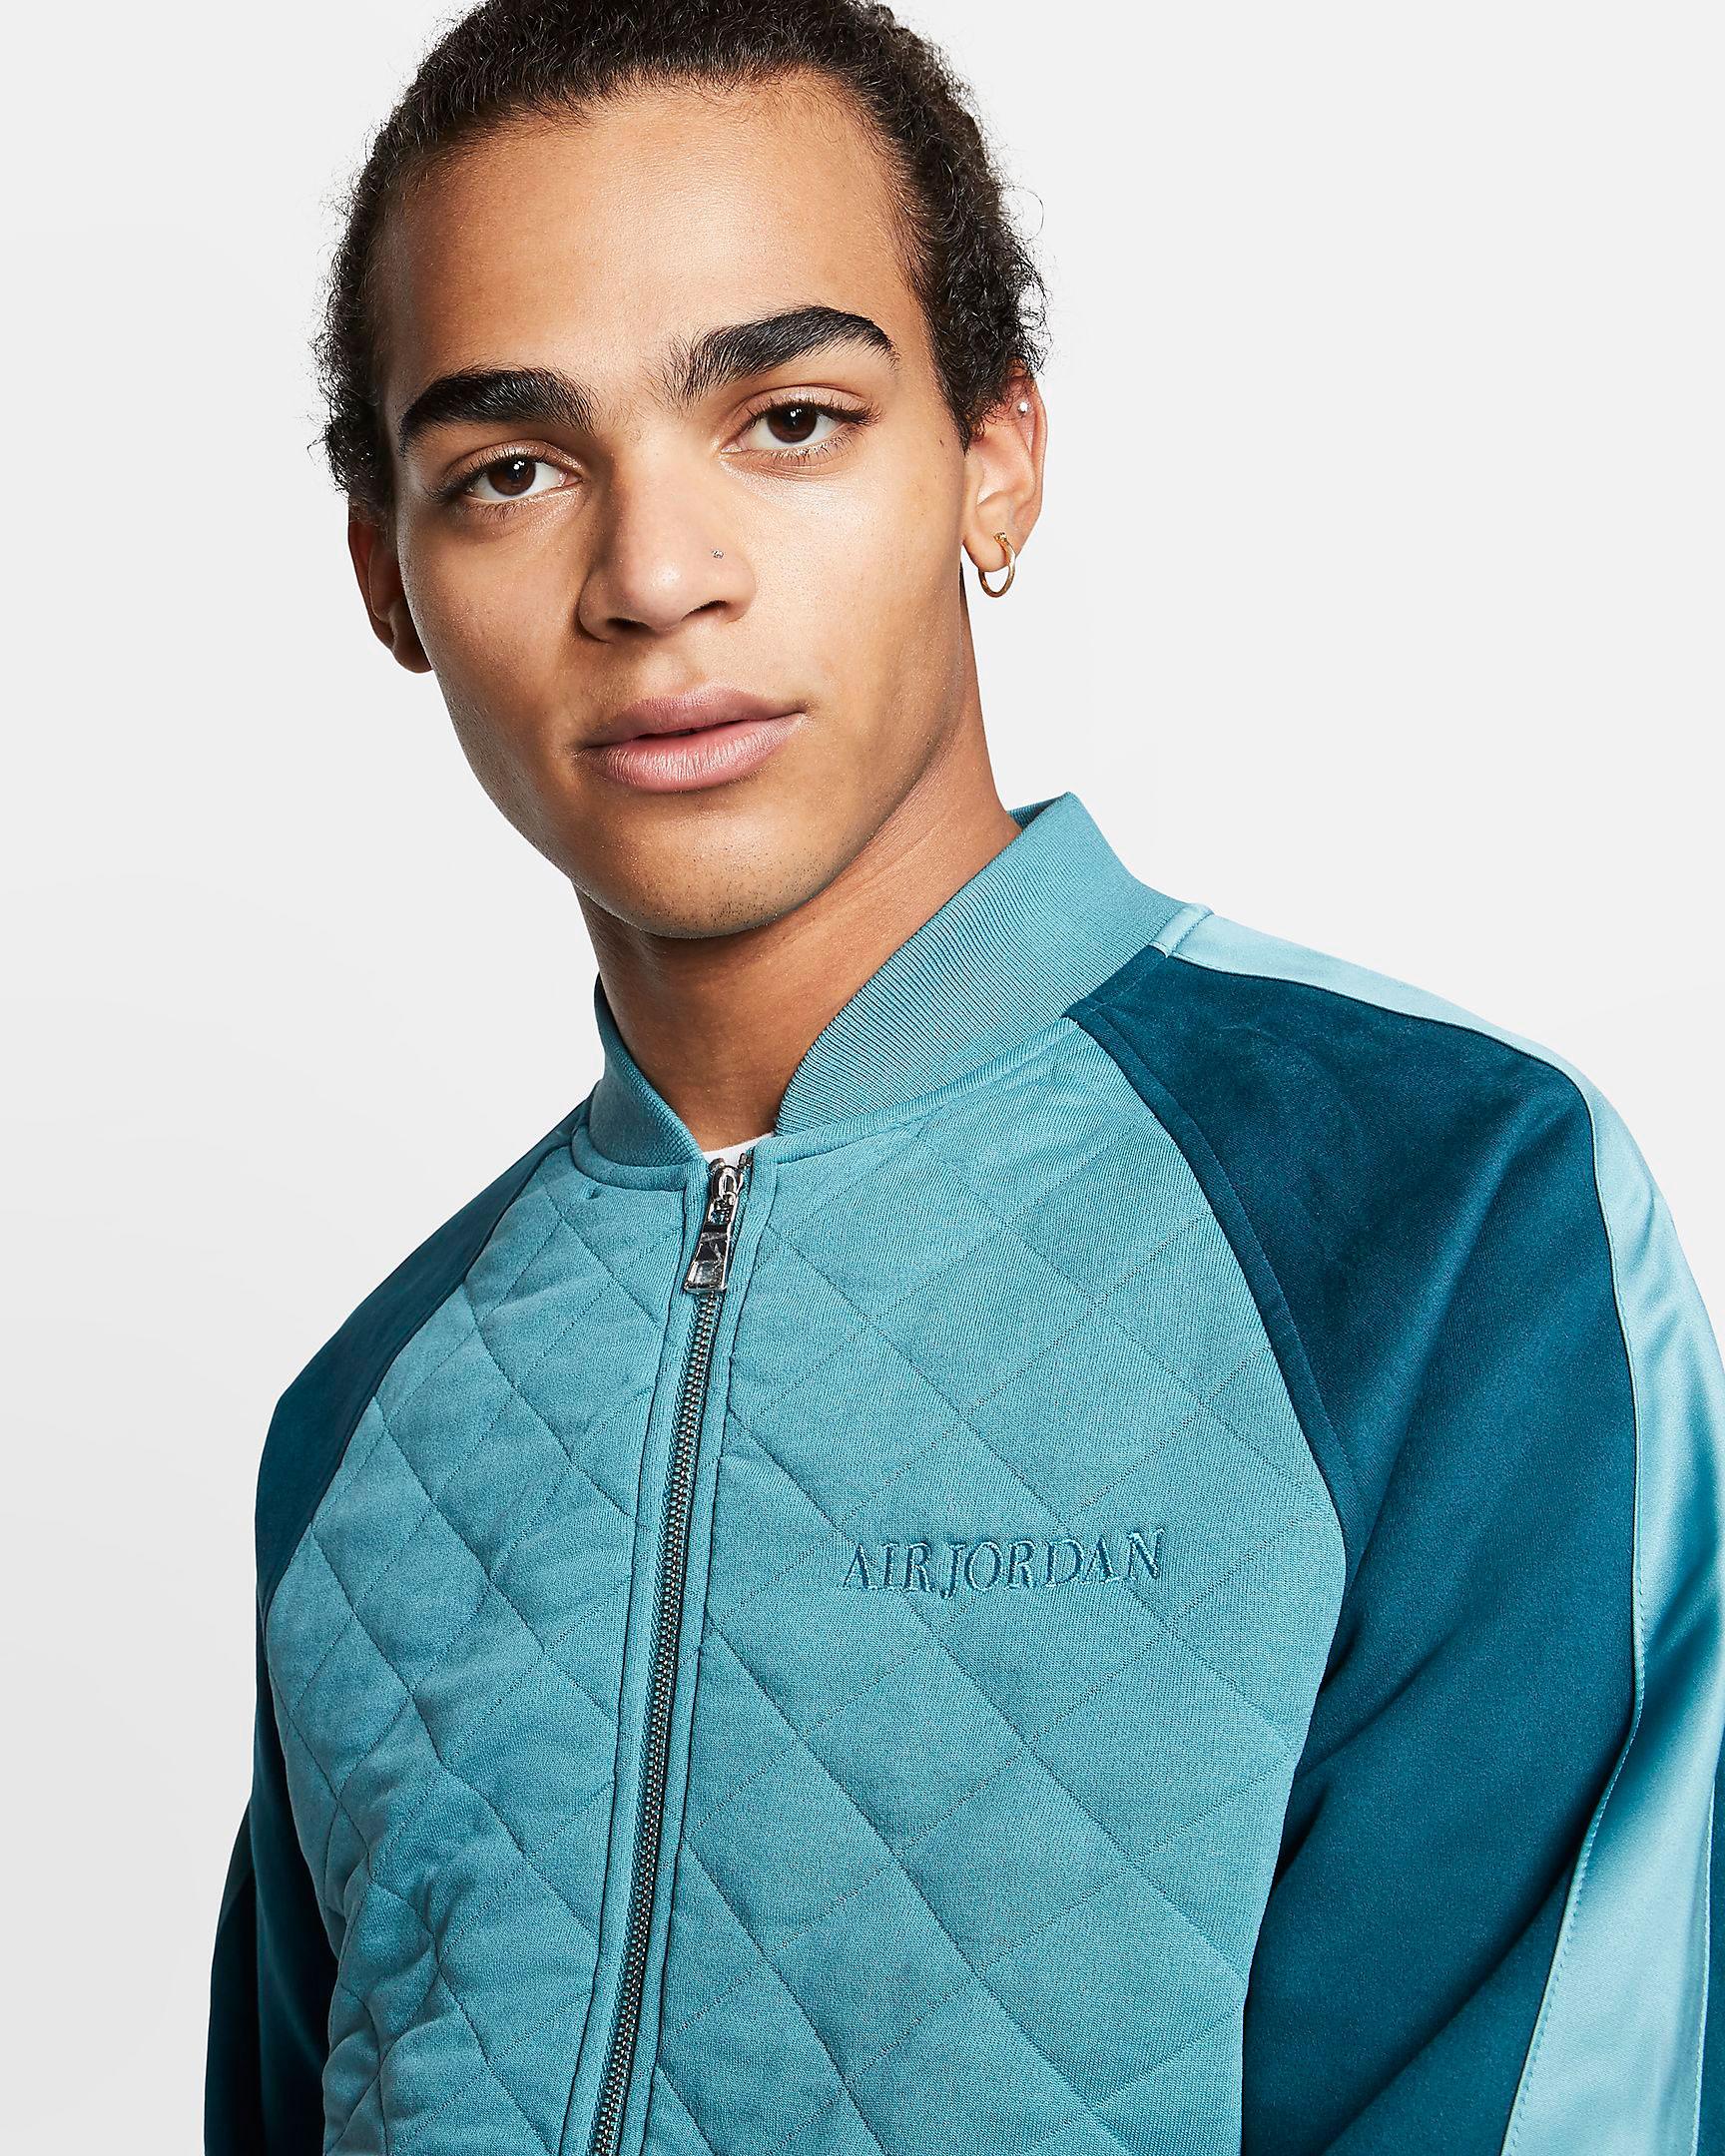 jordan-island-green-jacket-3